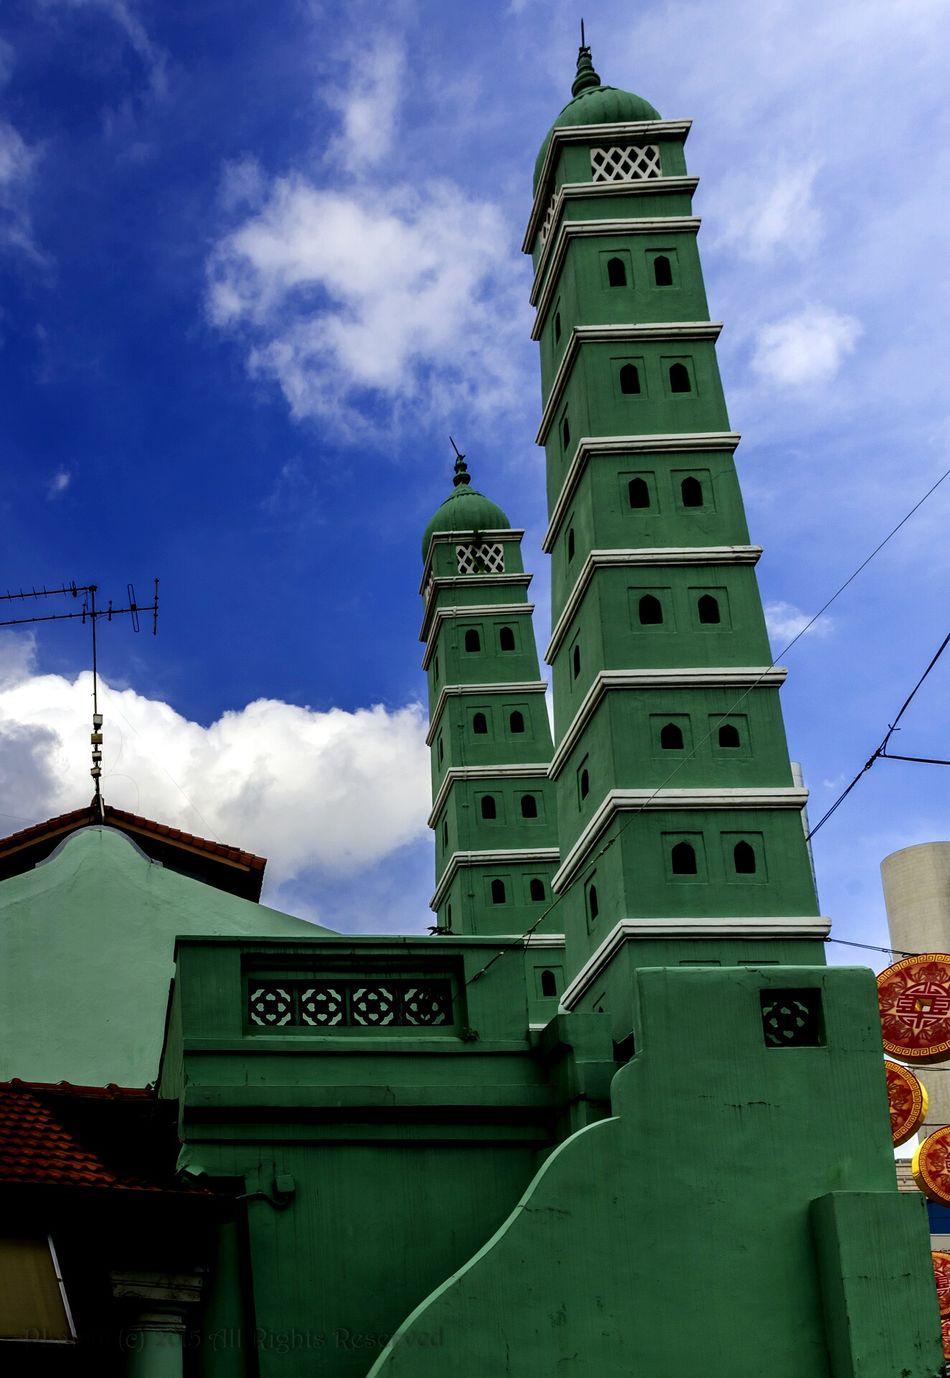 Masjid Chiulia. EyeEm , EyeEmChinatownPhotowalk , Mosque , Heritage , Cny 2015 , Architecture , Faith , Worship